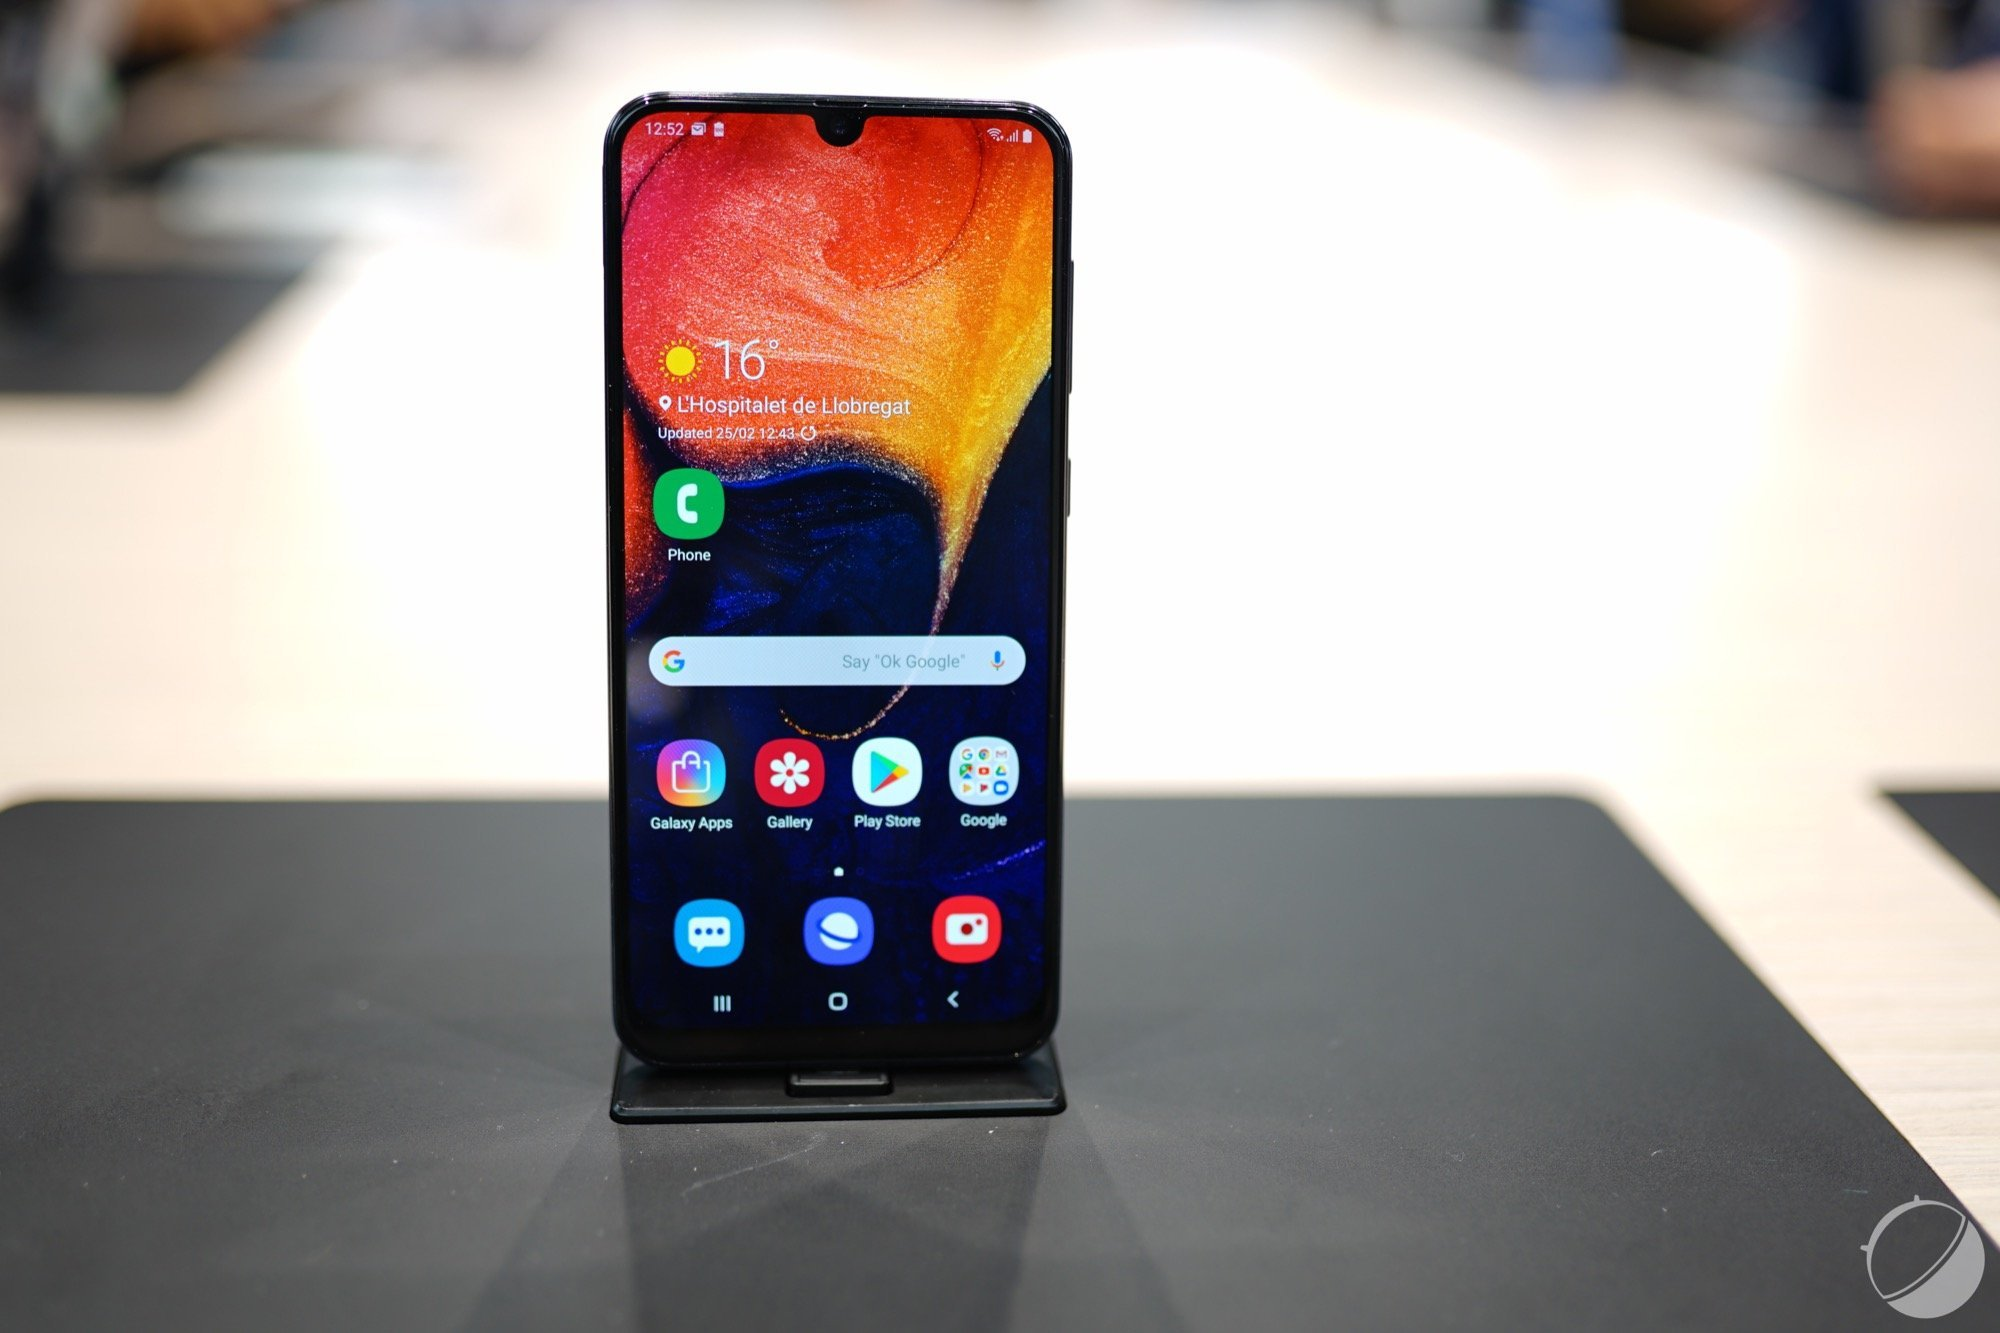 Samsung Galaxy A90, A40, A20e : toujours plus de smartphones milieu de gamme prévus en Europe